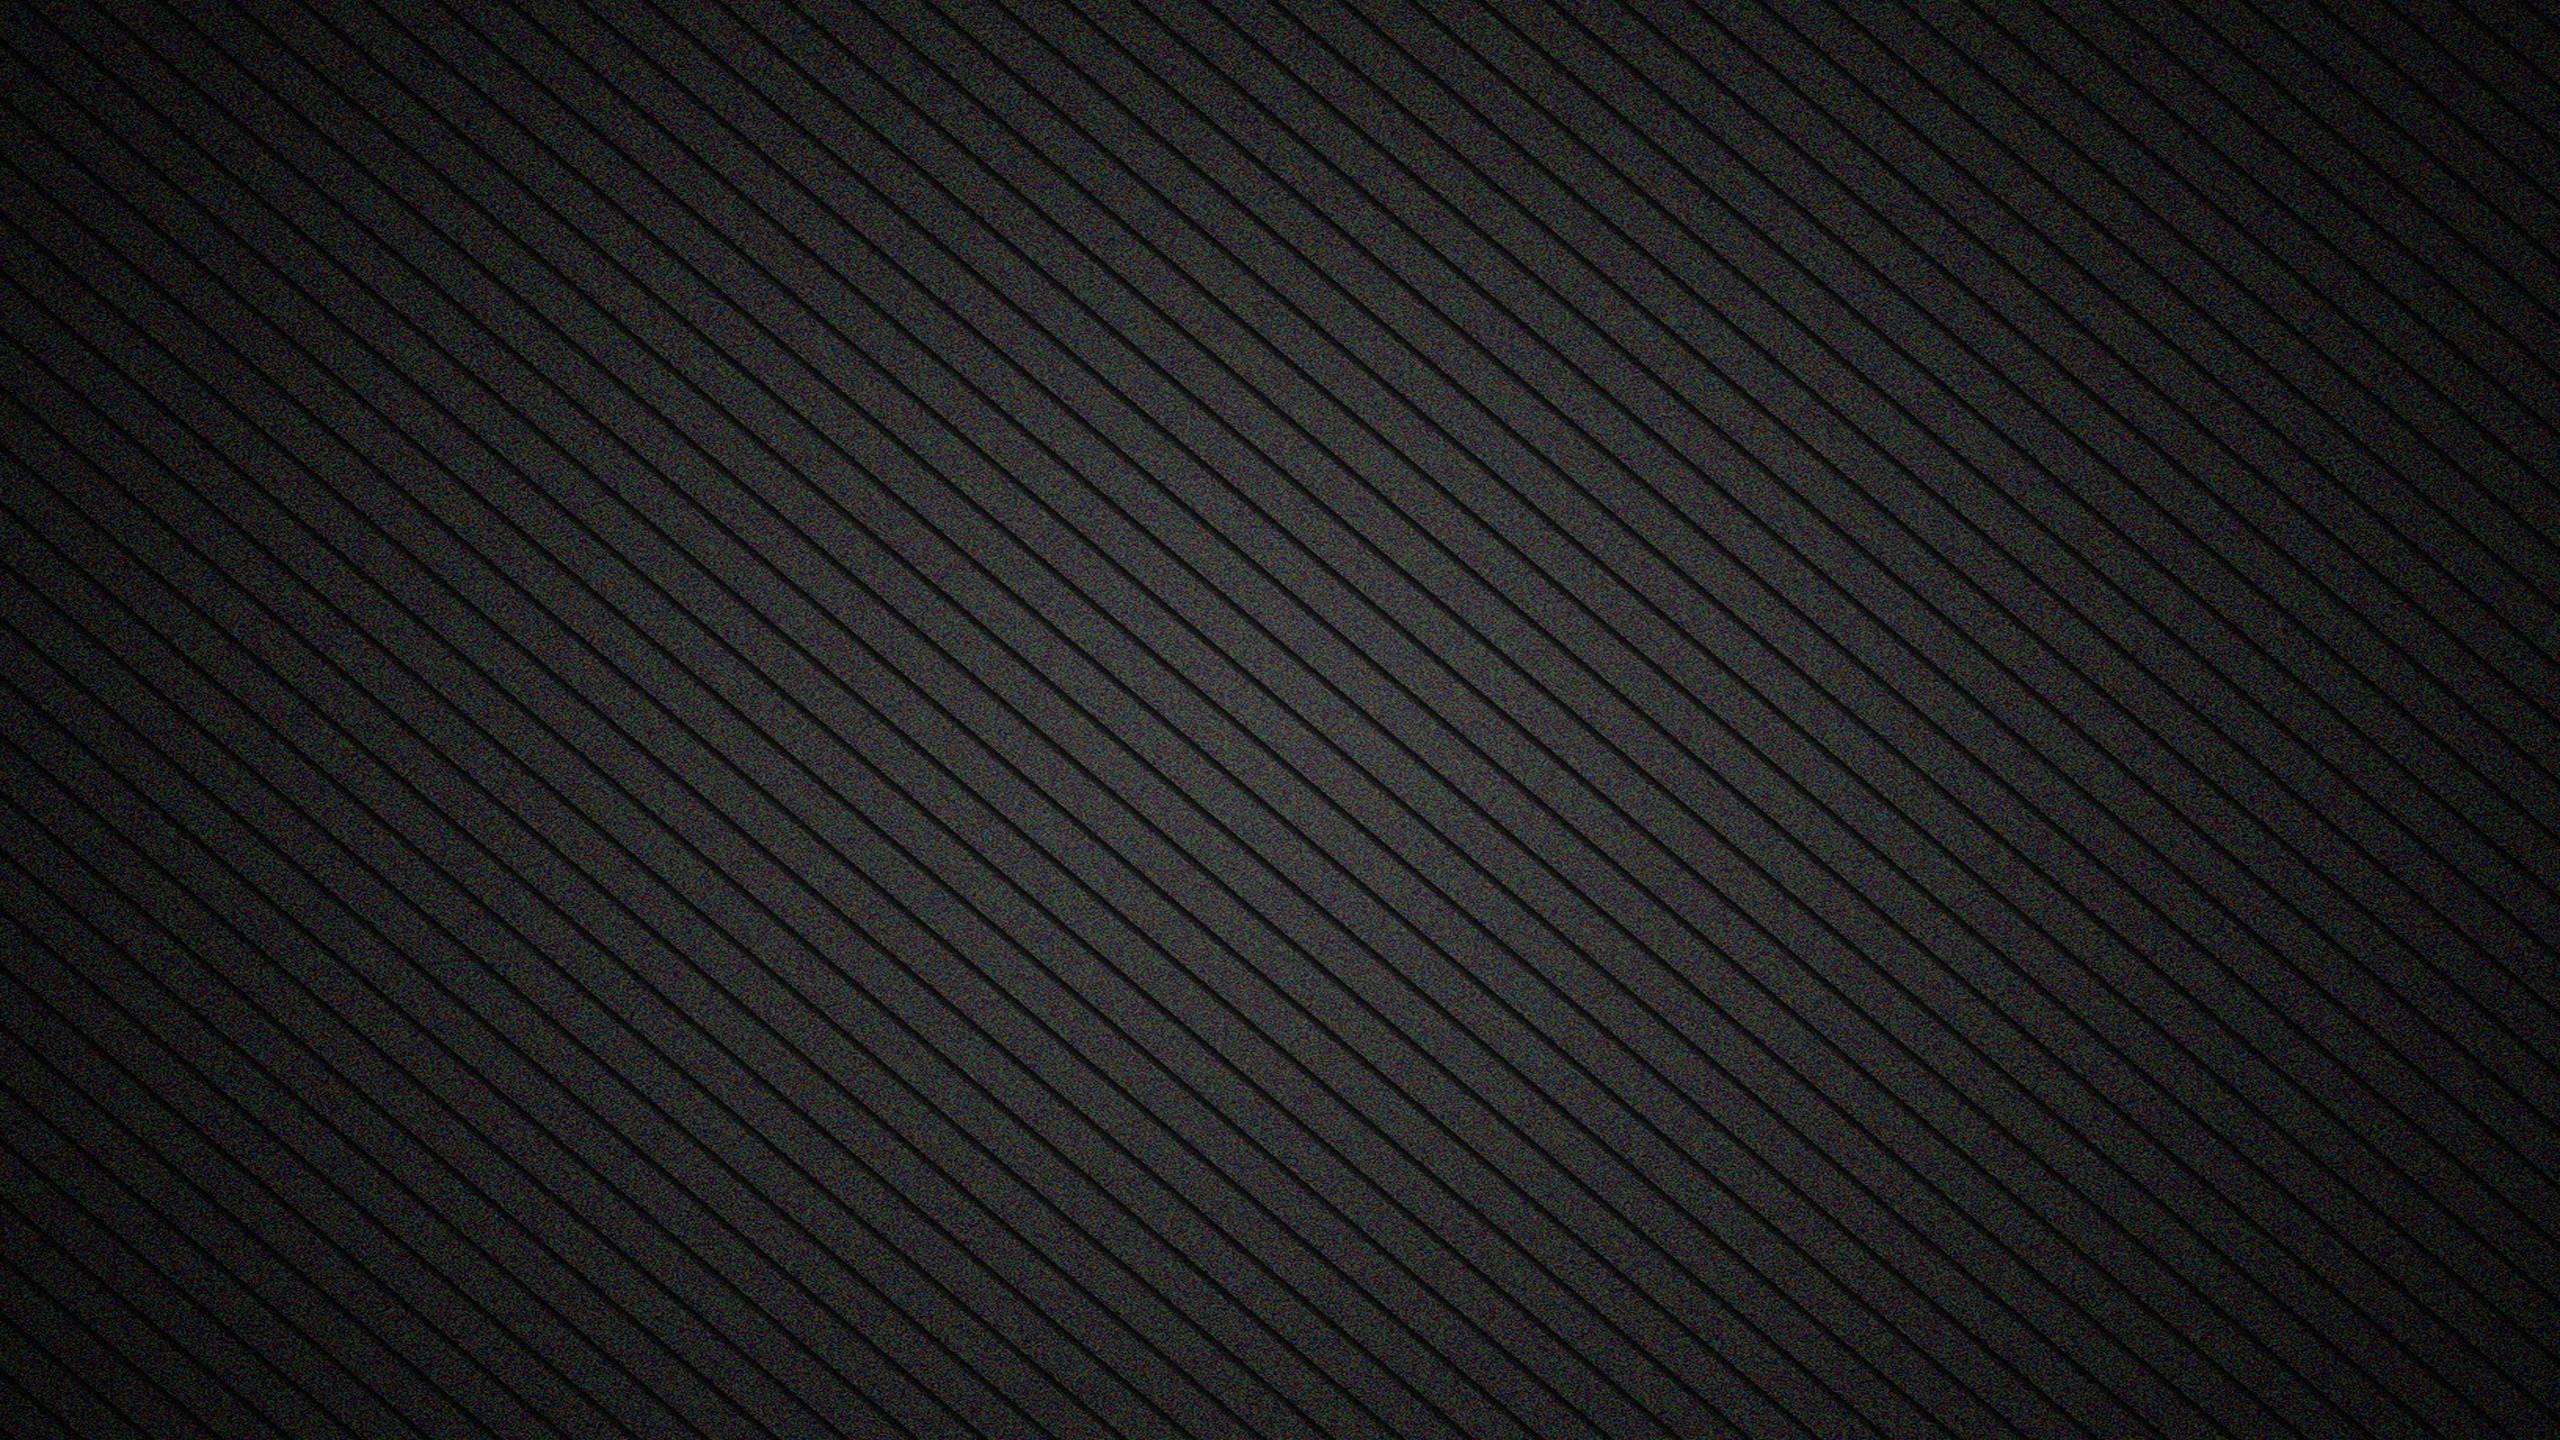 wallpaper B wallpapertp Wallpaper 2560 x 1440 Wallpapers)